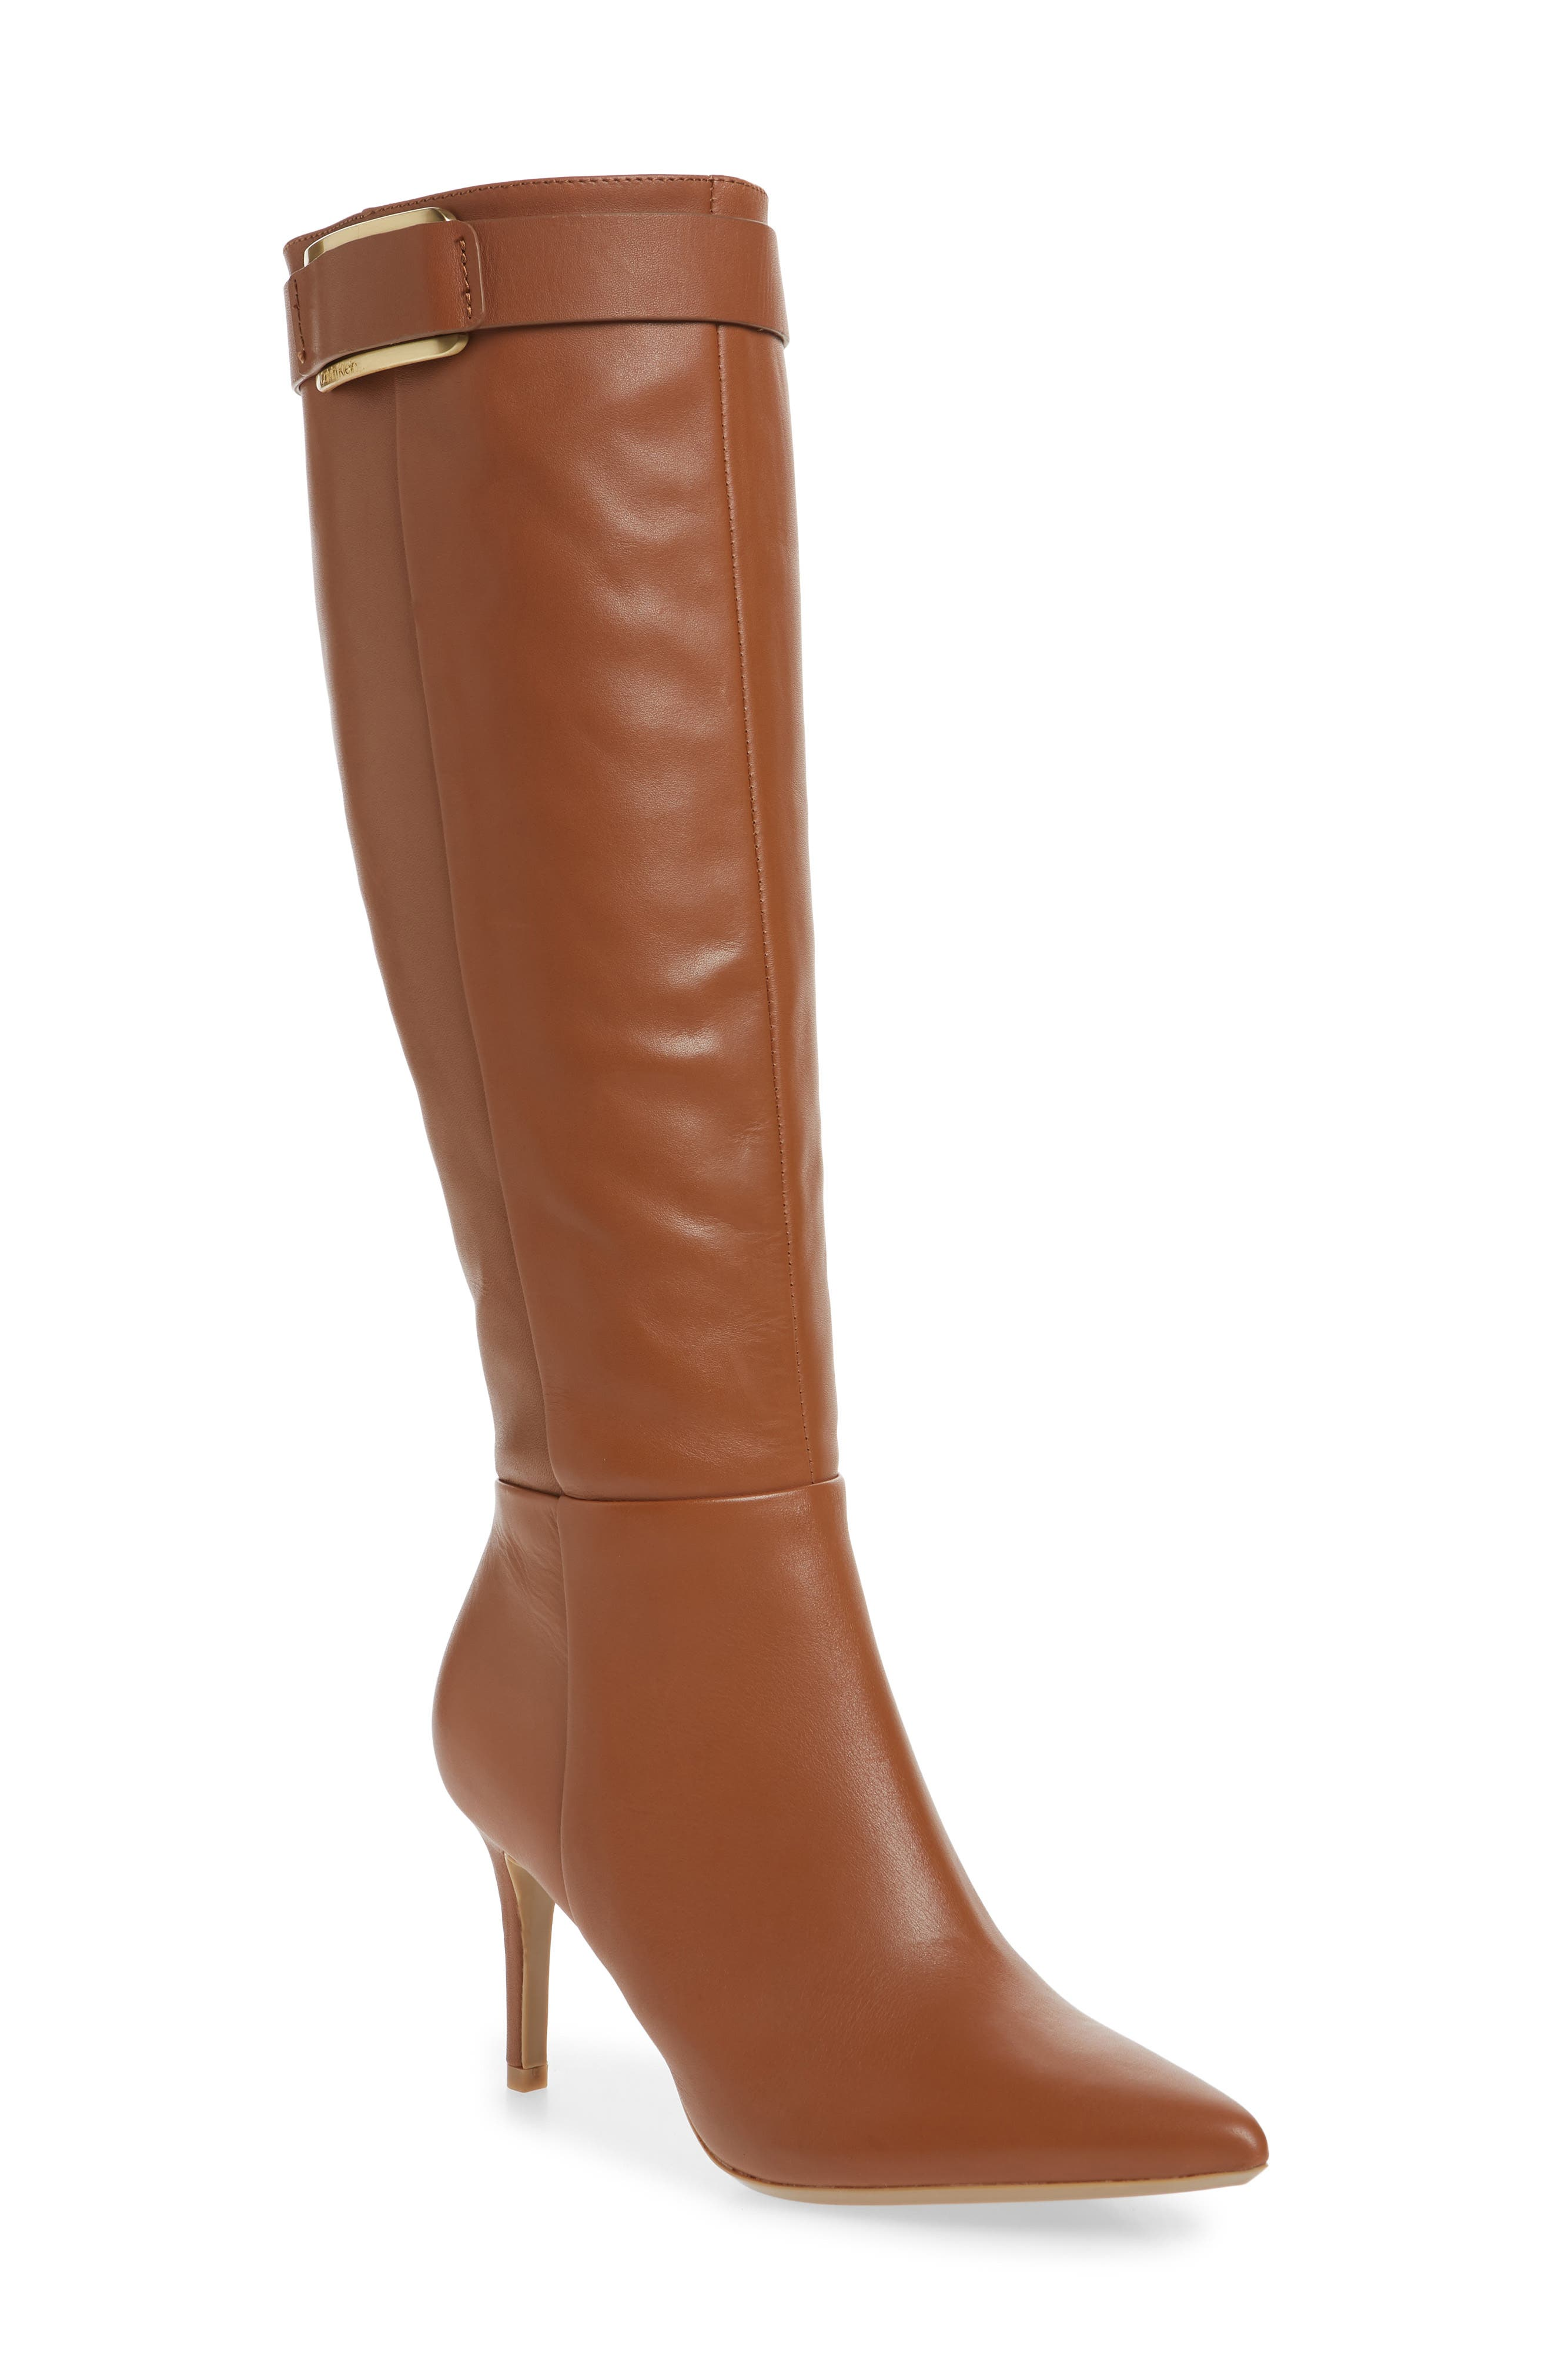 Calvin Klein Glydia Stiletto Knee High Boot, Wide Calf- Brown